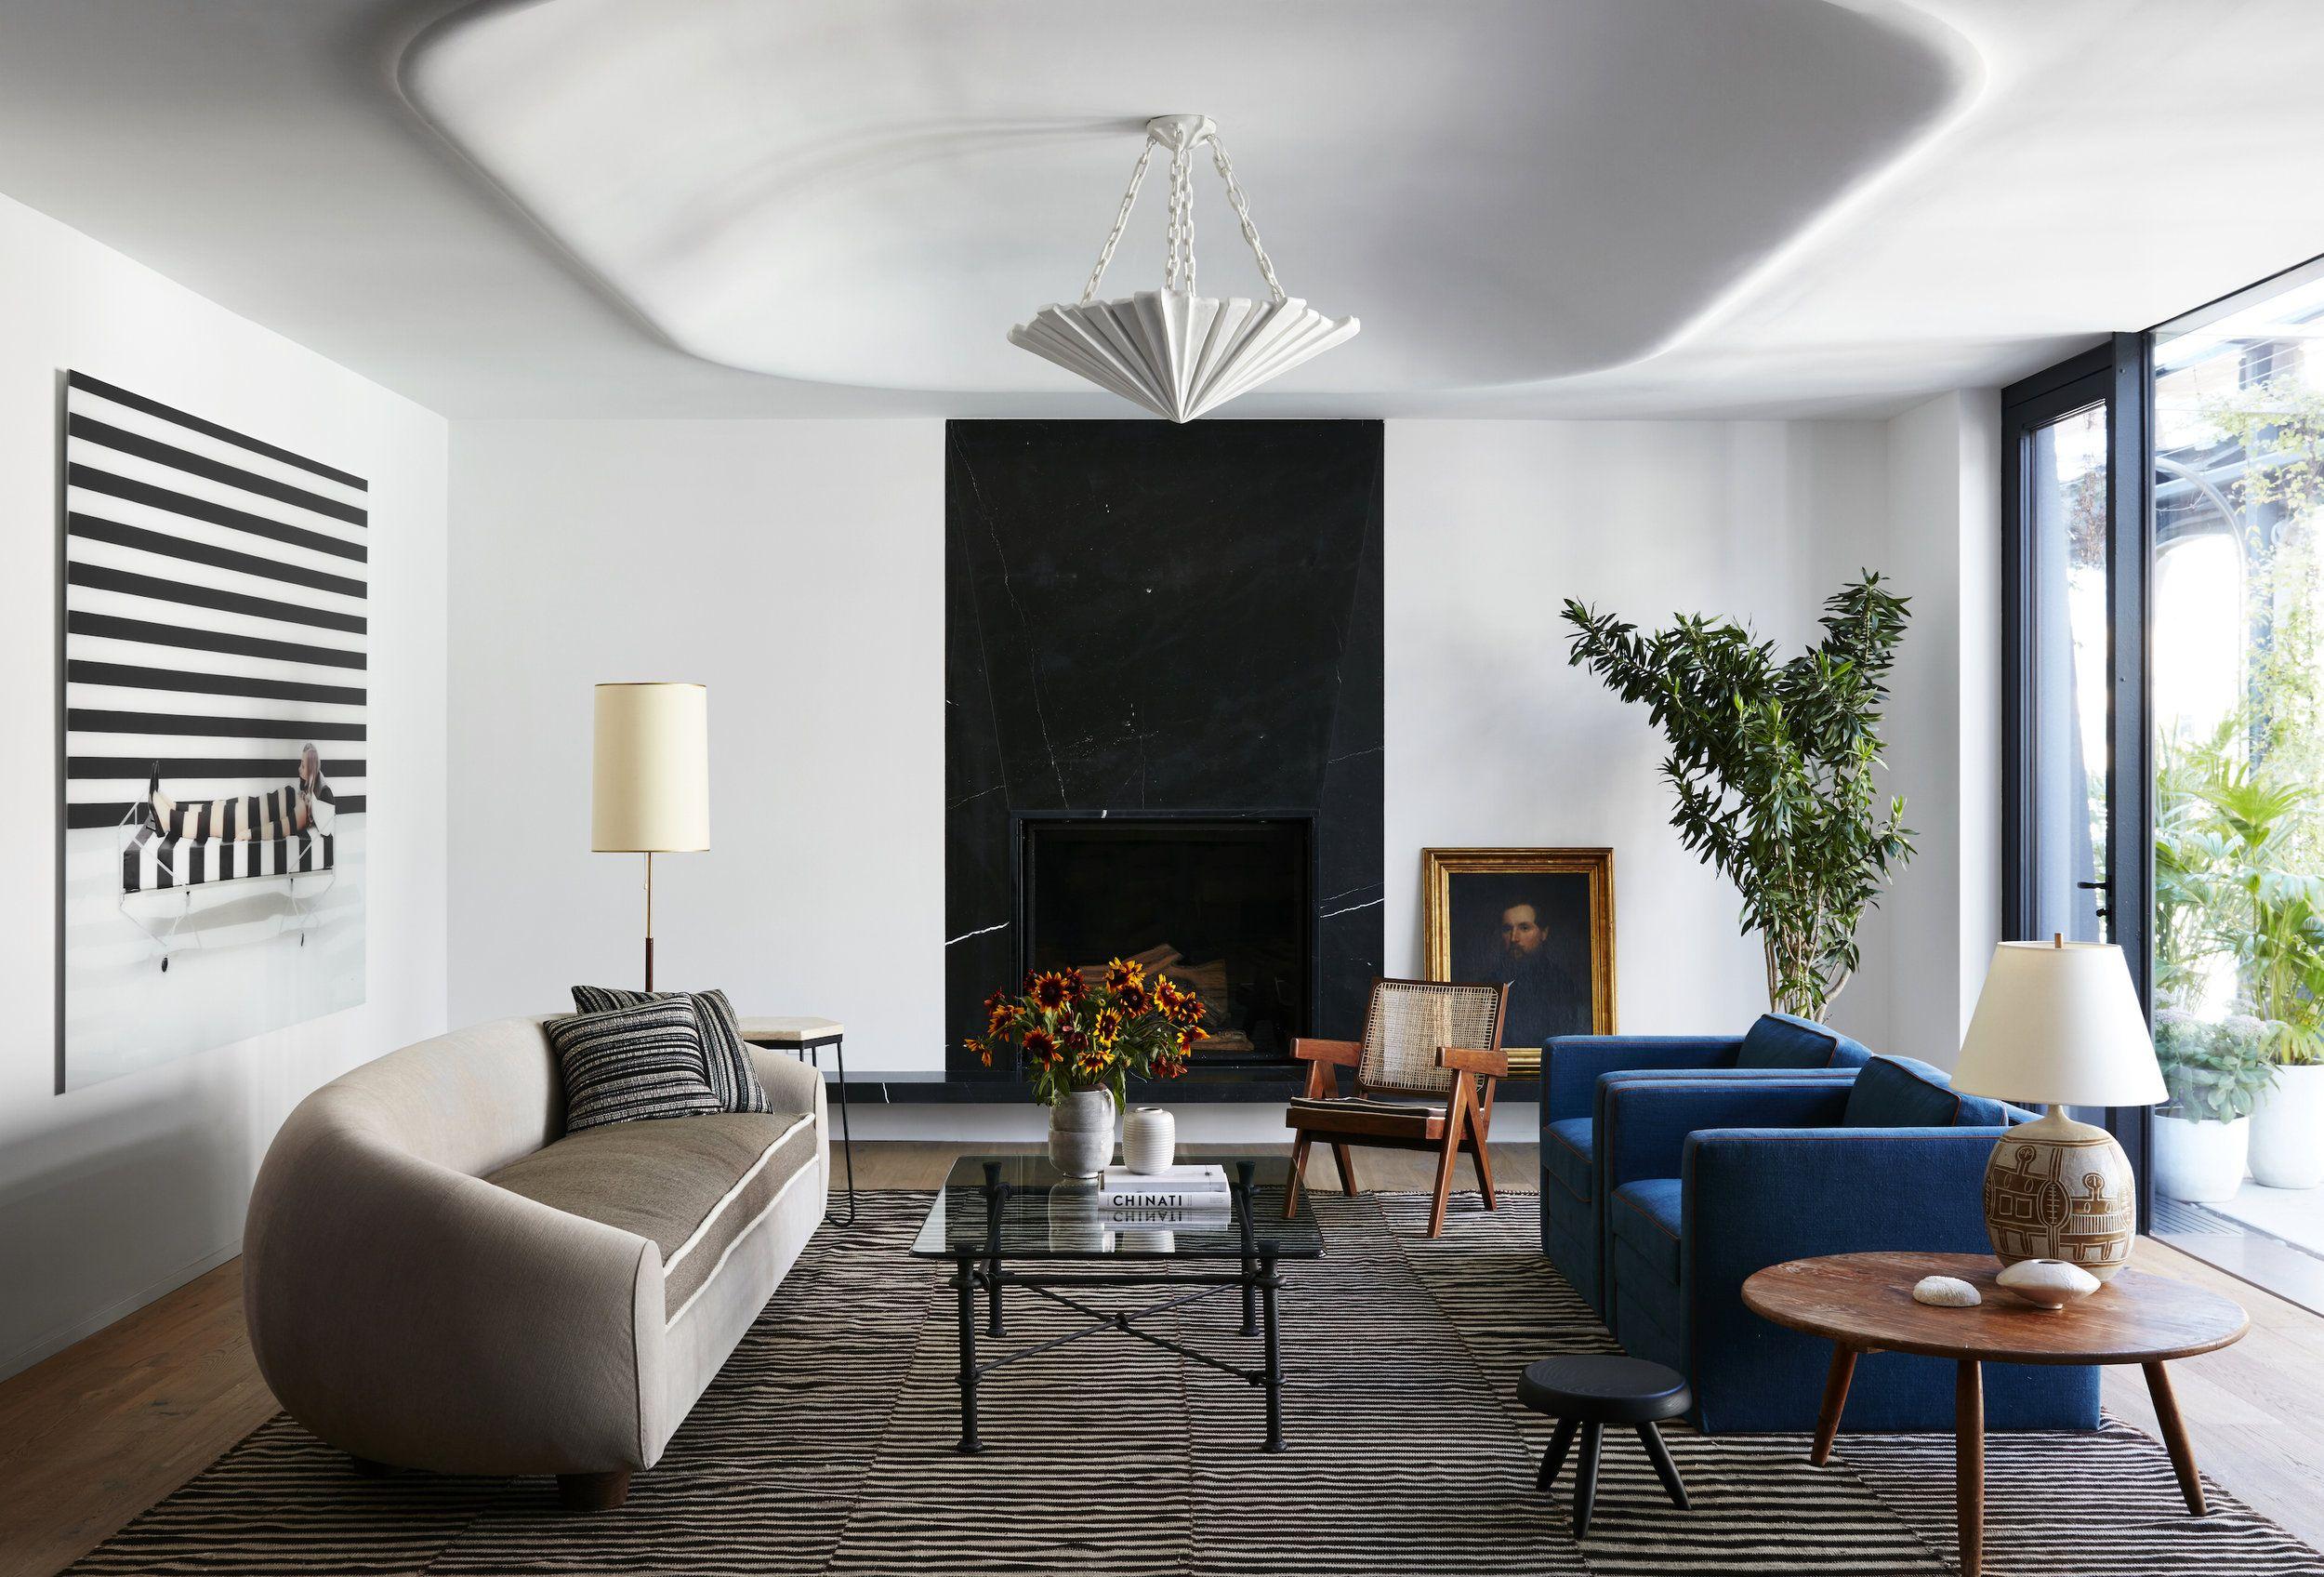 Xoco By Ddg Interior Designed By Neal Beckstedt Studio